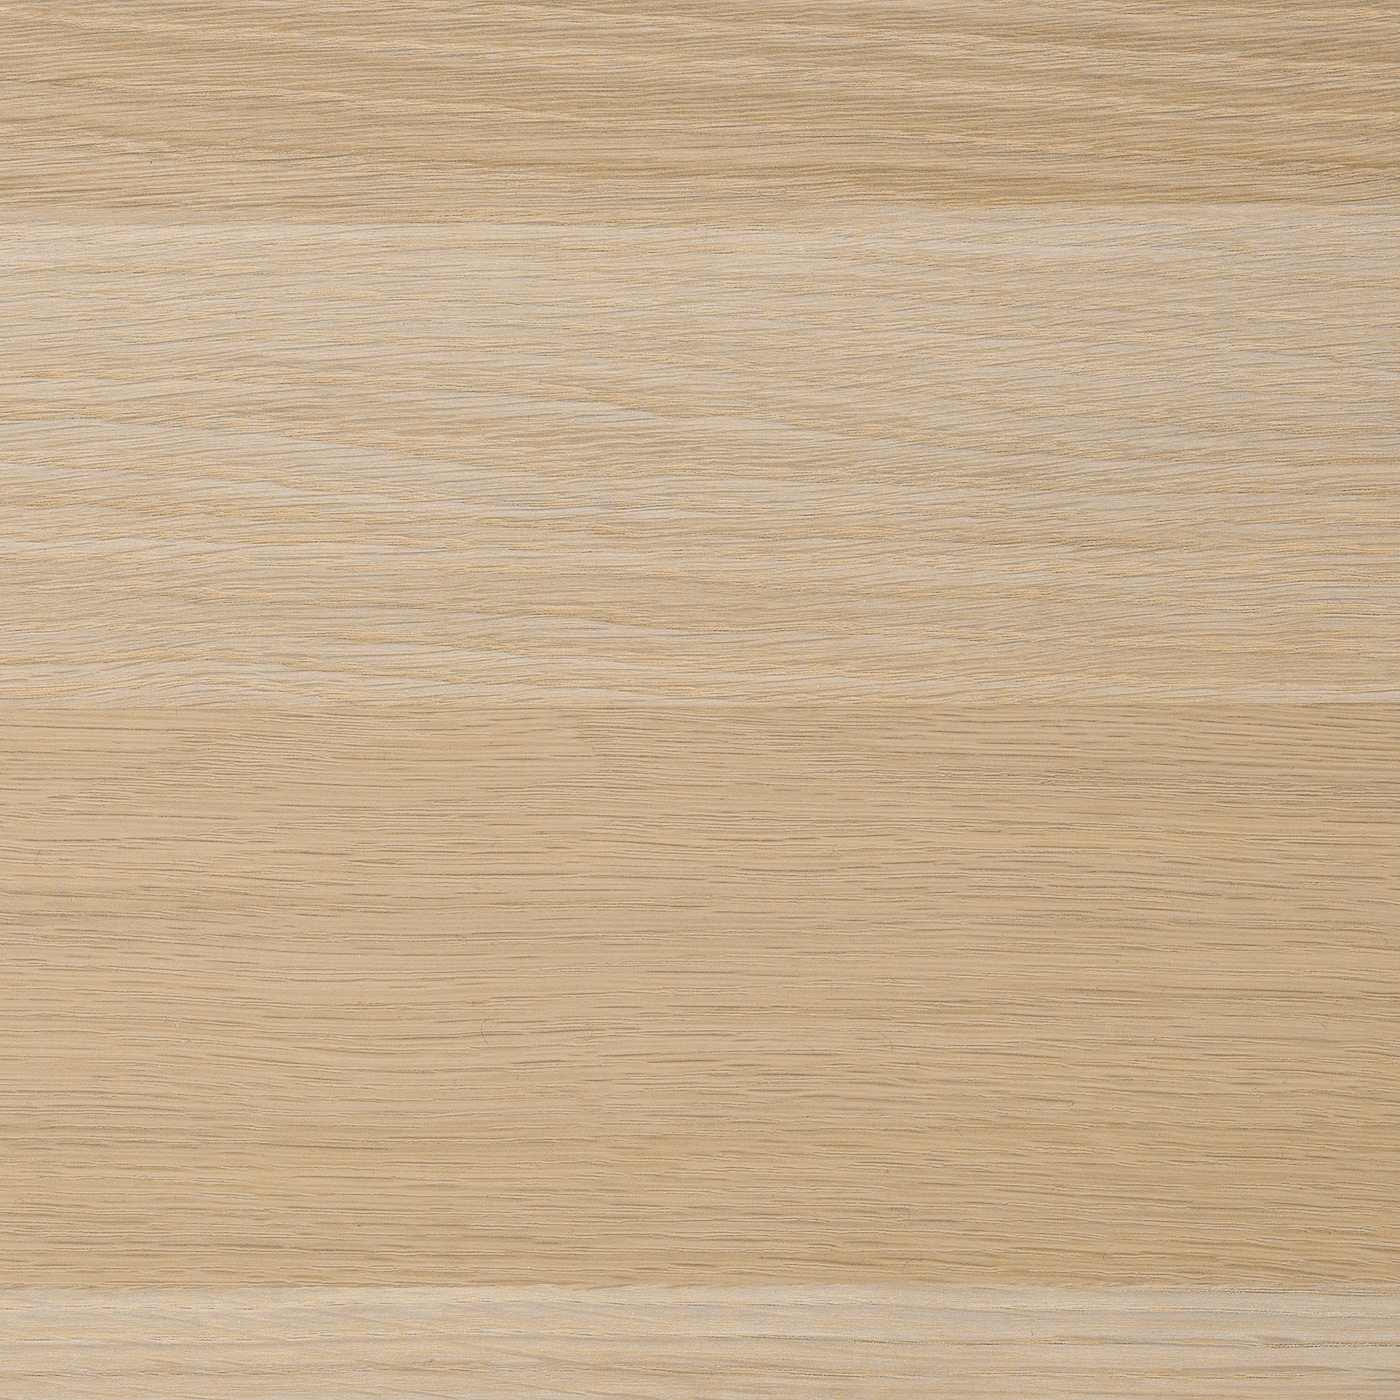 KOMPLEMENT Shelf, white stained oak effect, 75x58 cm